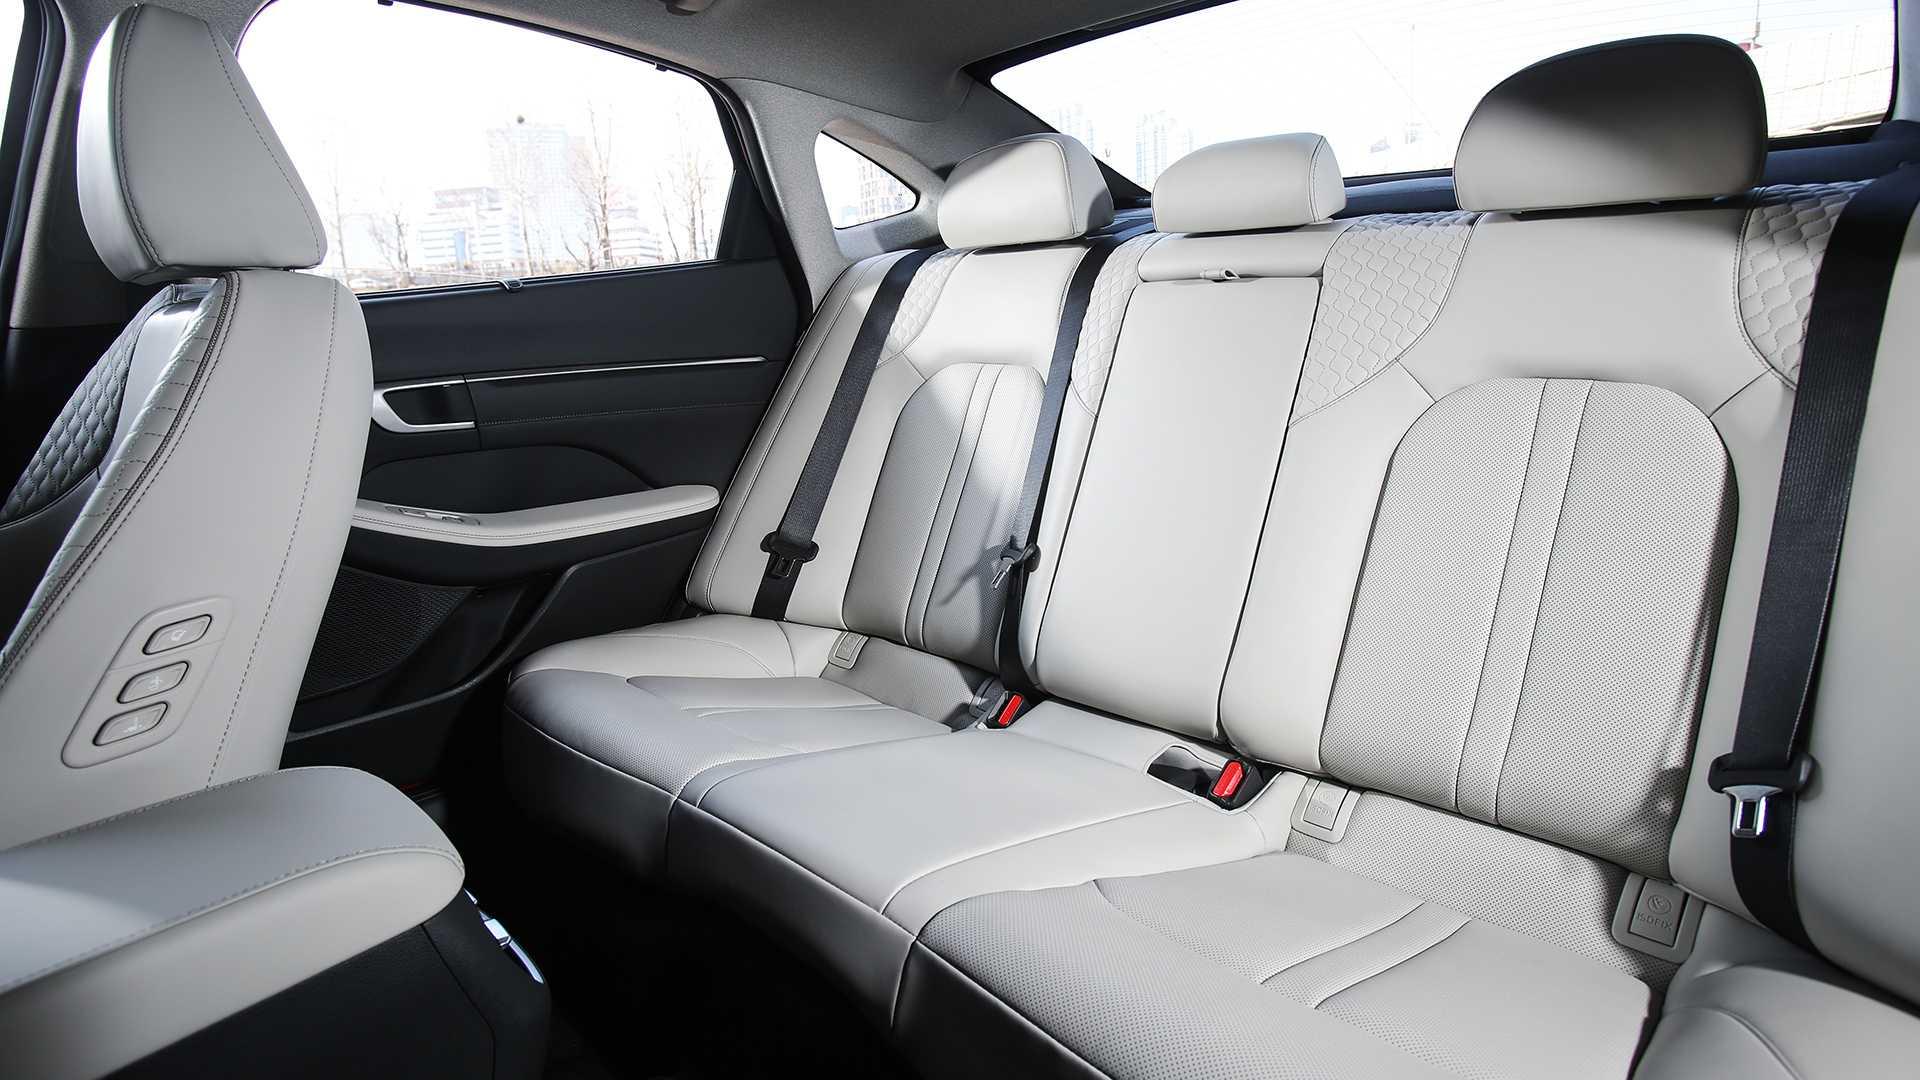 Hyundai Sonata 2020 N-Line sắp trình làng - 11